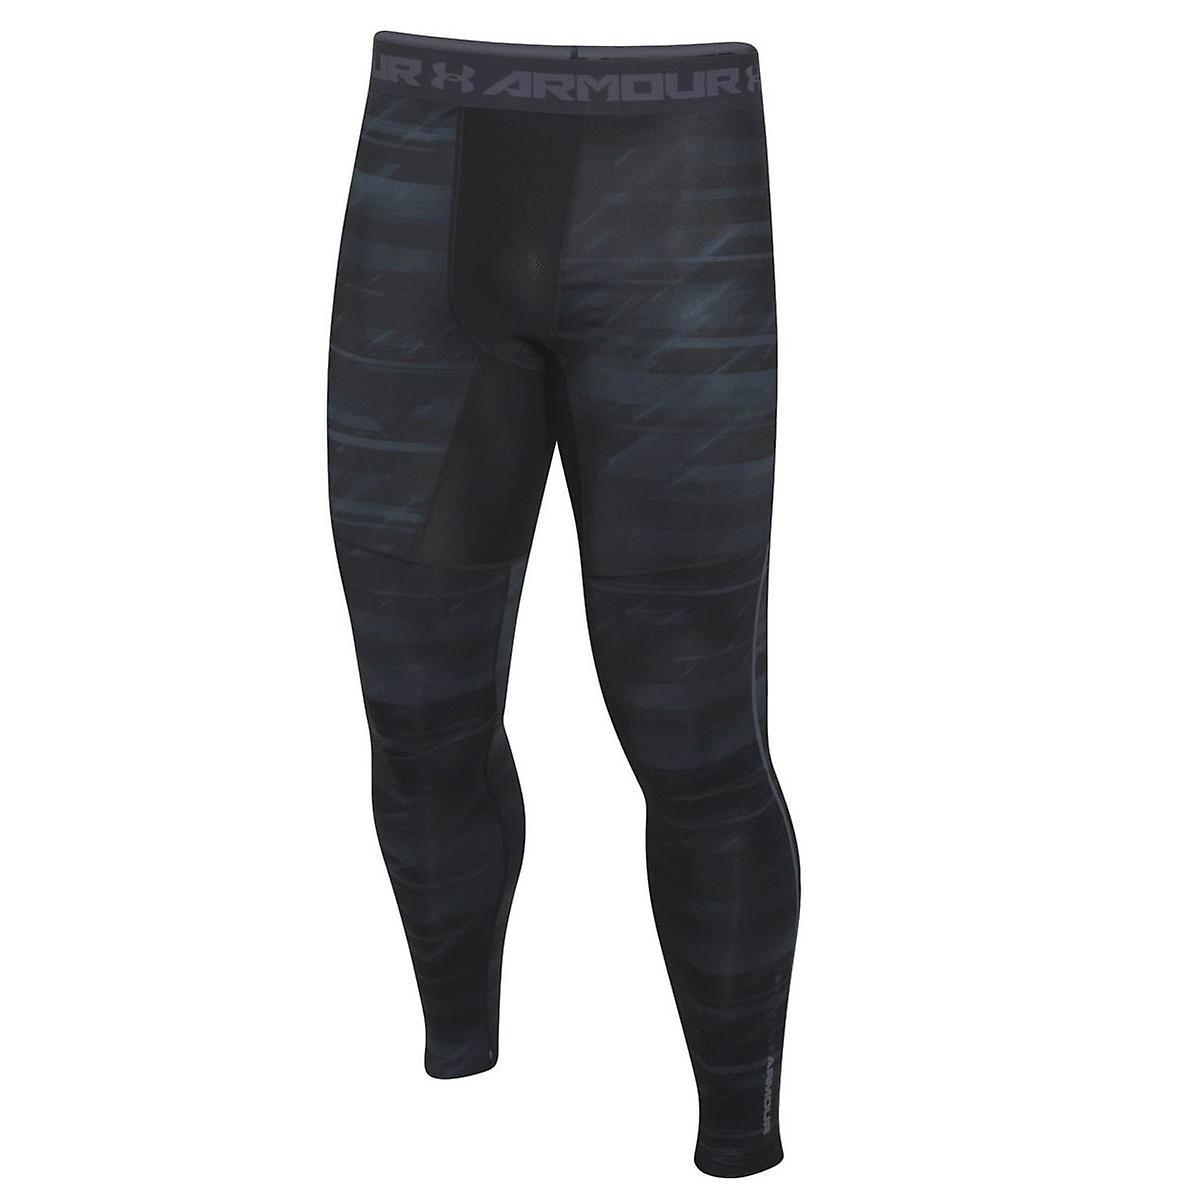 Under Armour ColdGear Armour Printed Compression Baselayer Legging Black